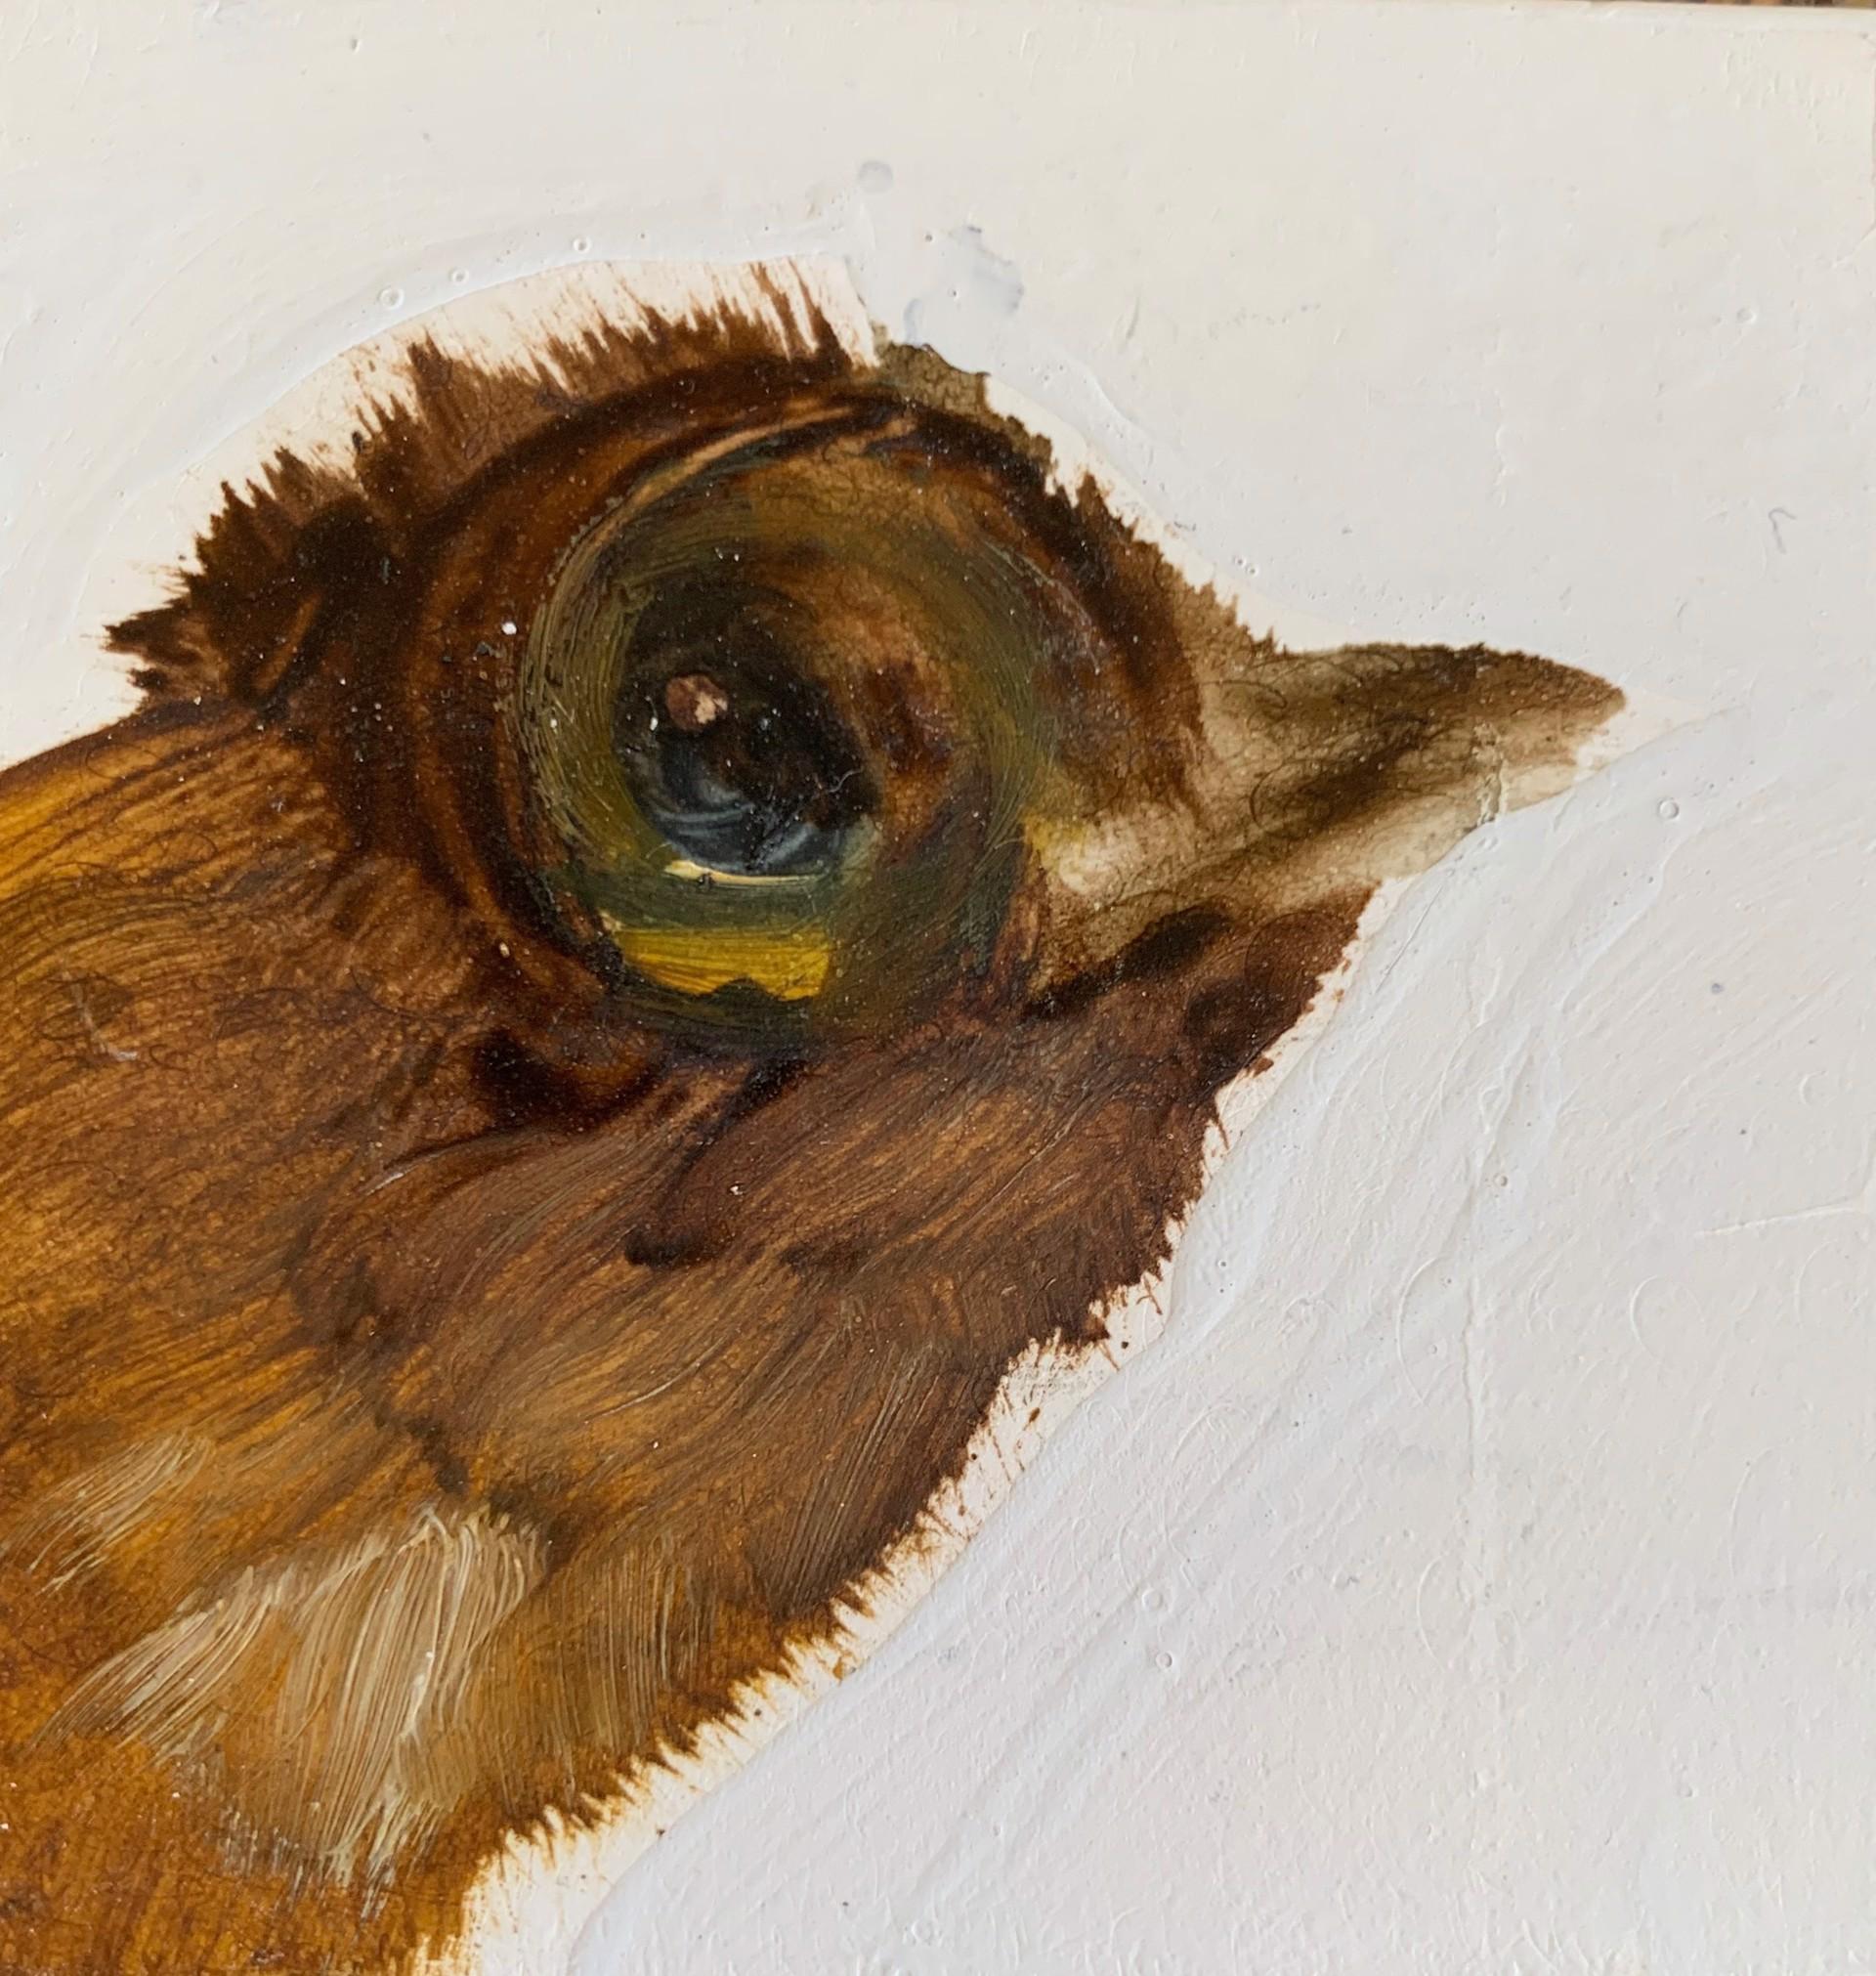 Little Bird #1 by Diane Kilgore Condon